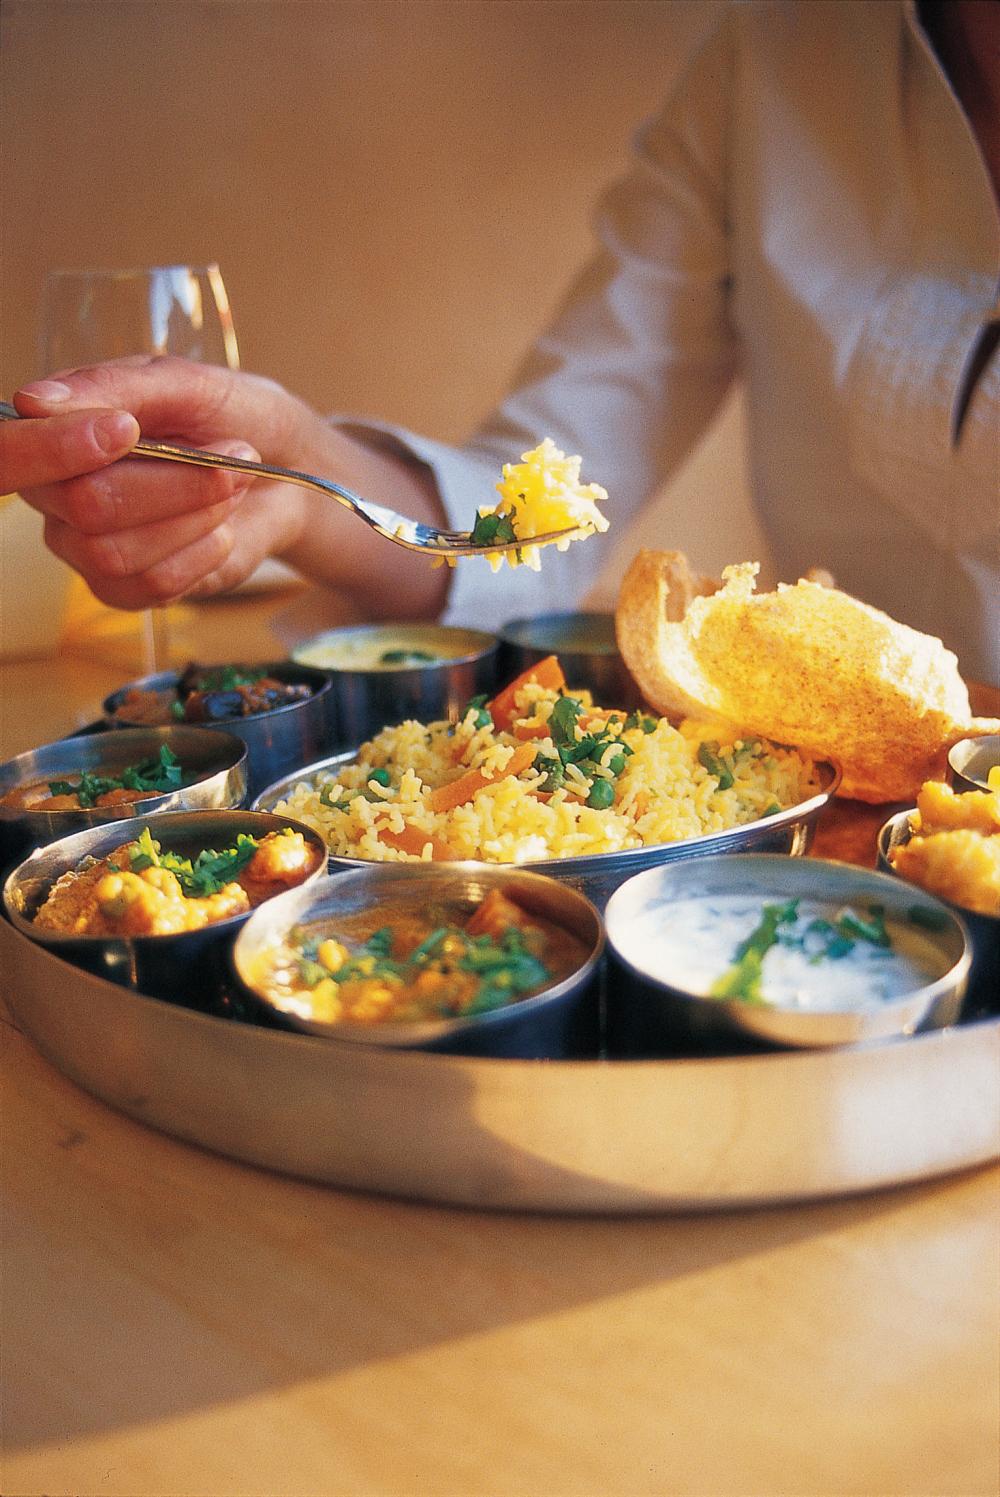 Sagar restaurants in fitzrovia london - Garden state plaza mall restaurants ...